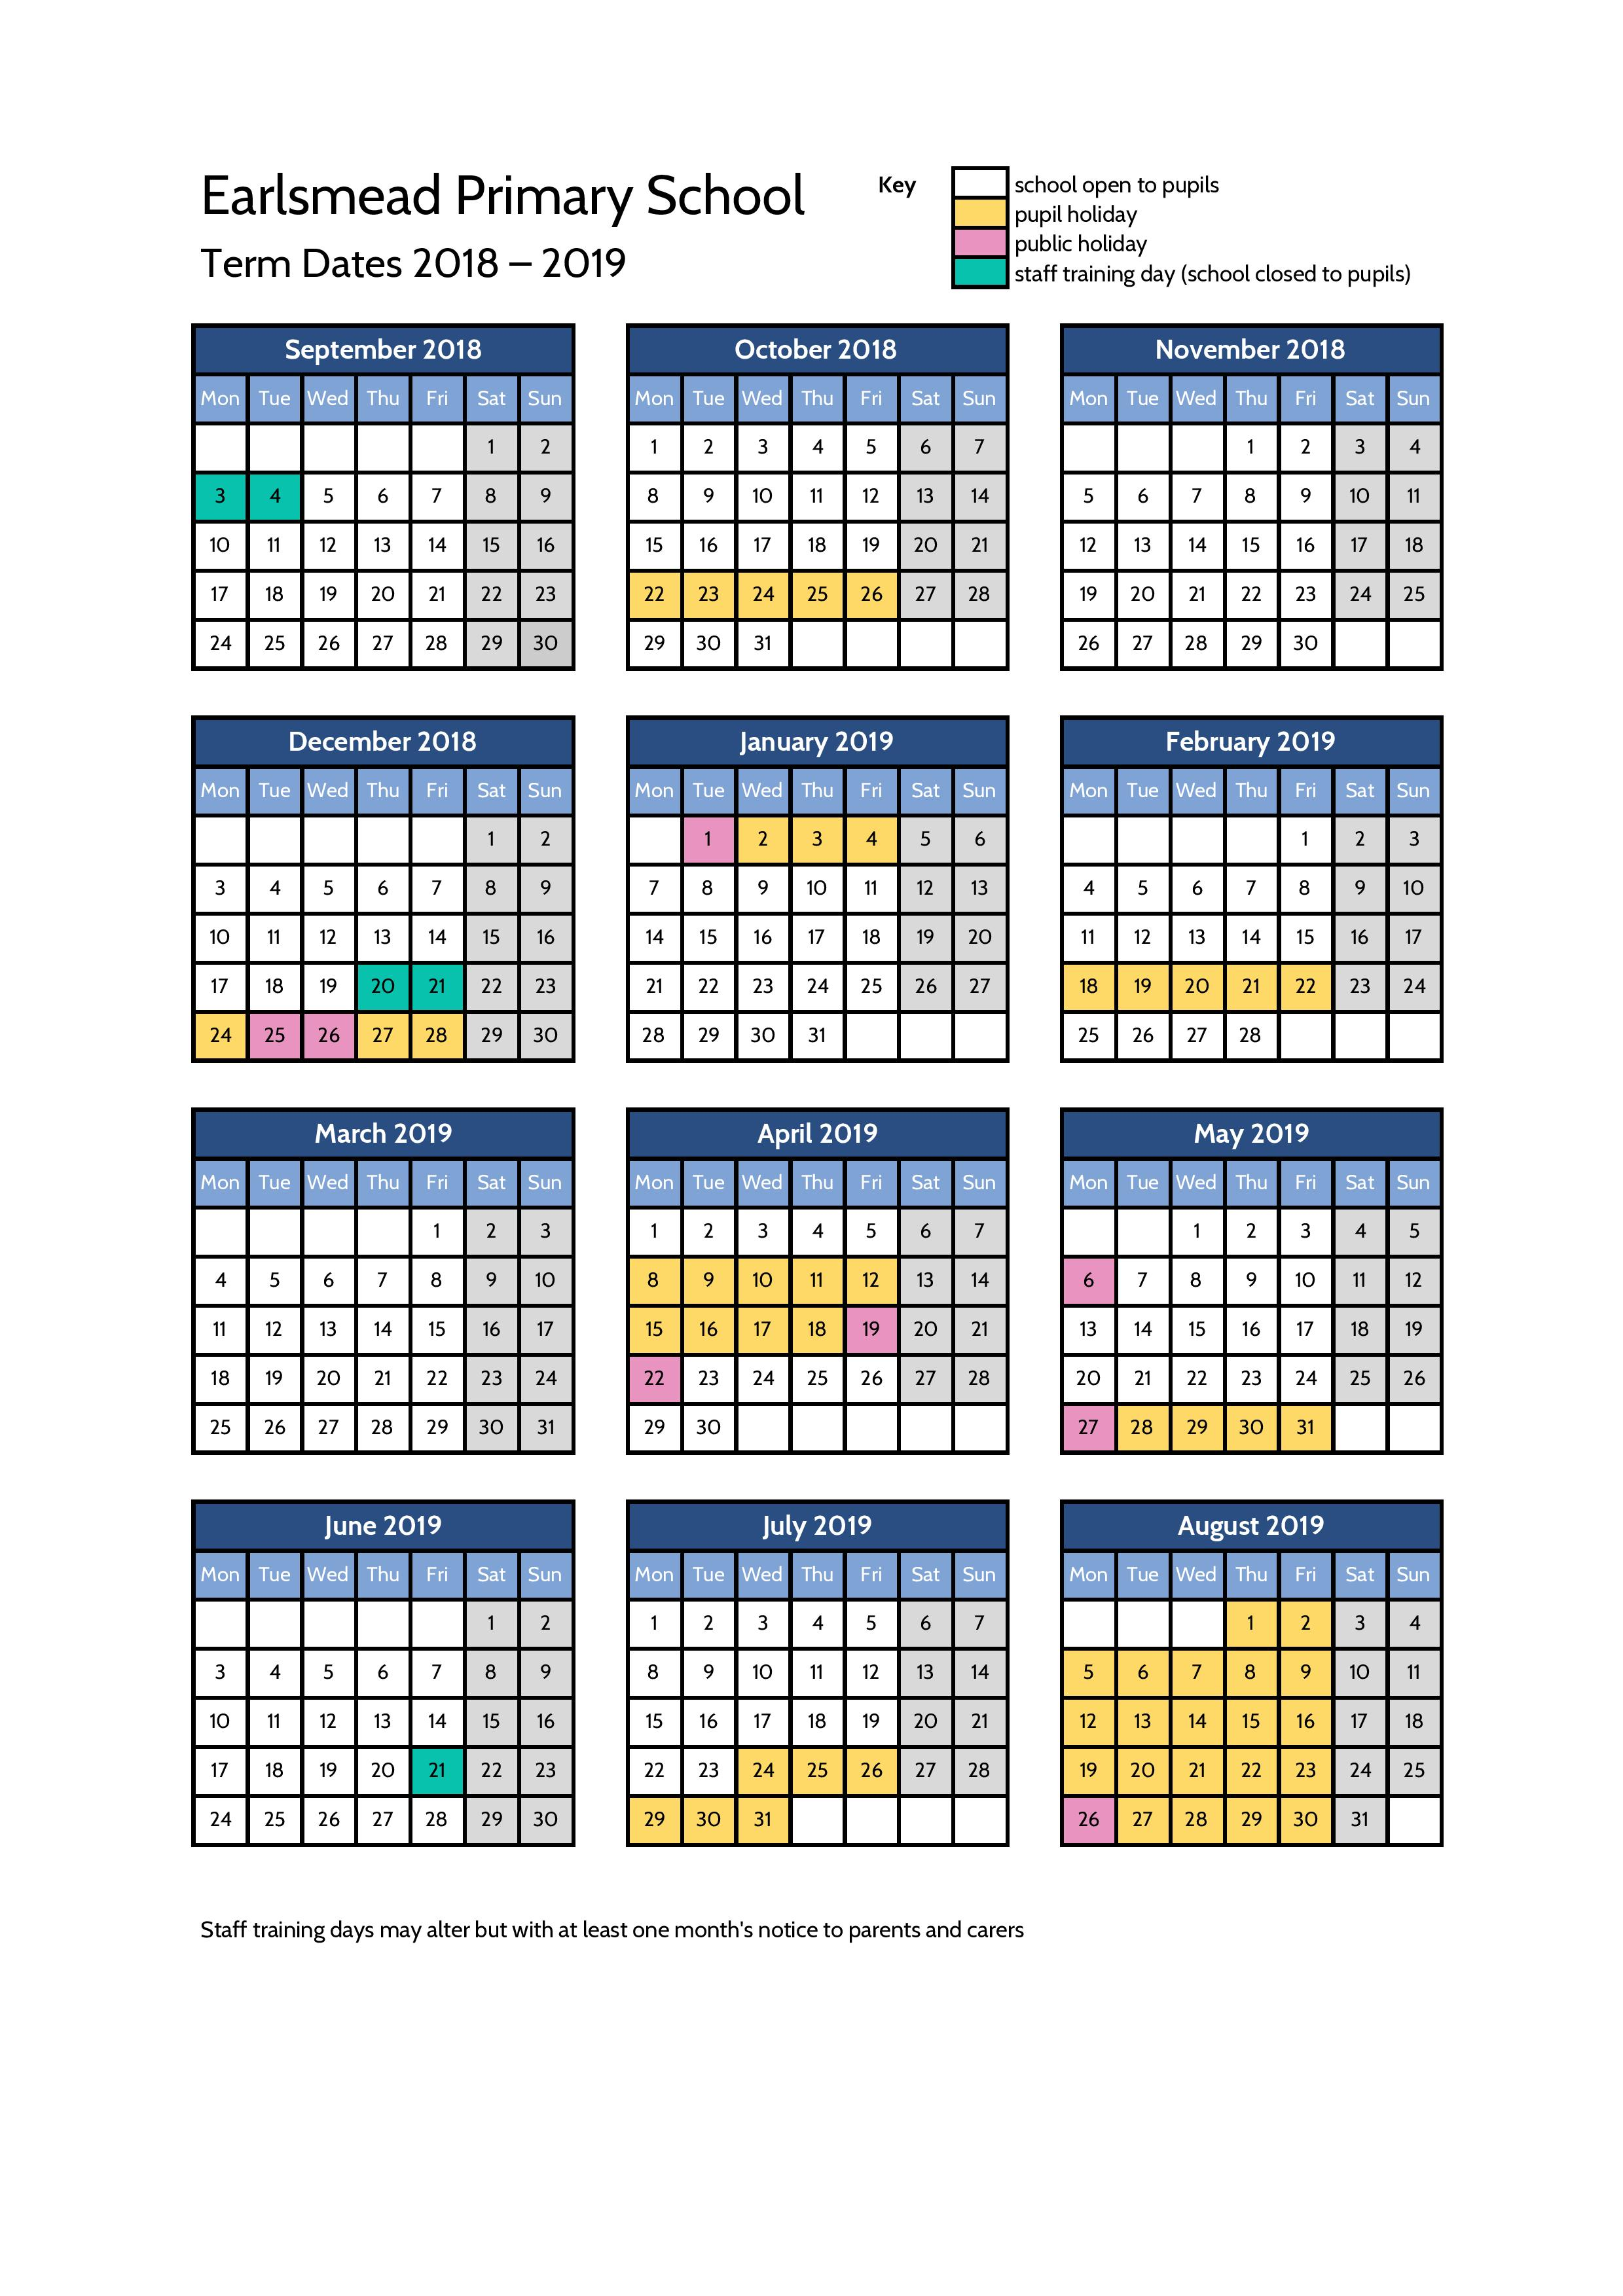 Earlsmead School Term Dates 2018-19 - Term Dates-page-001.jpg